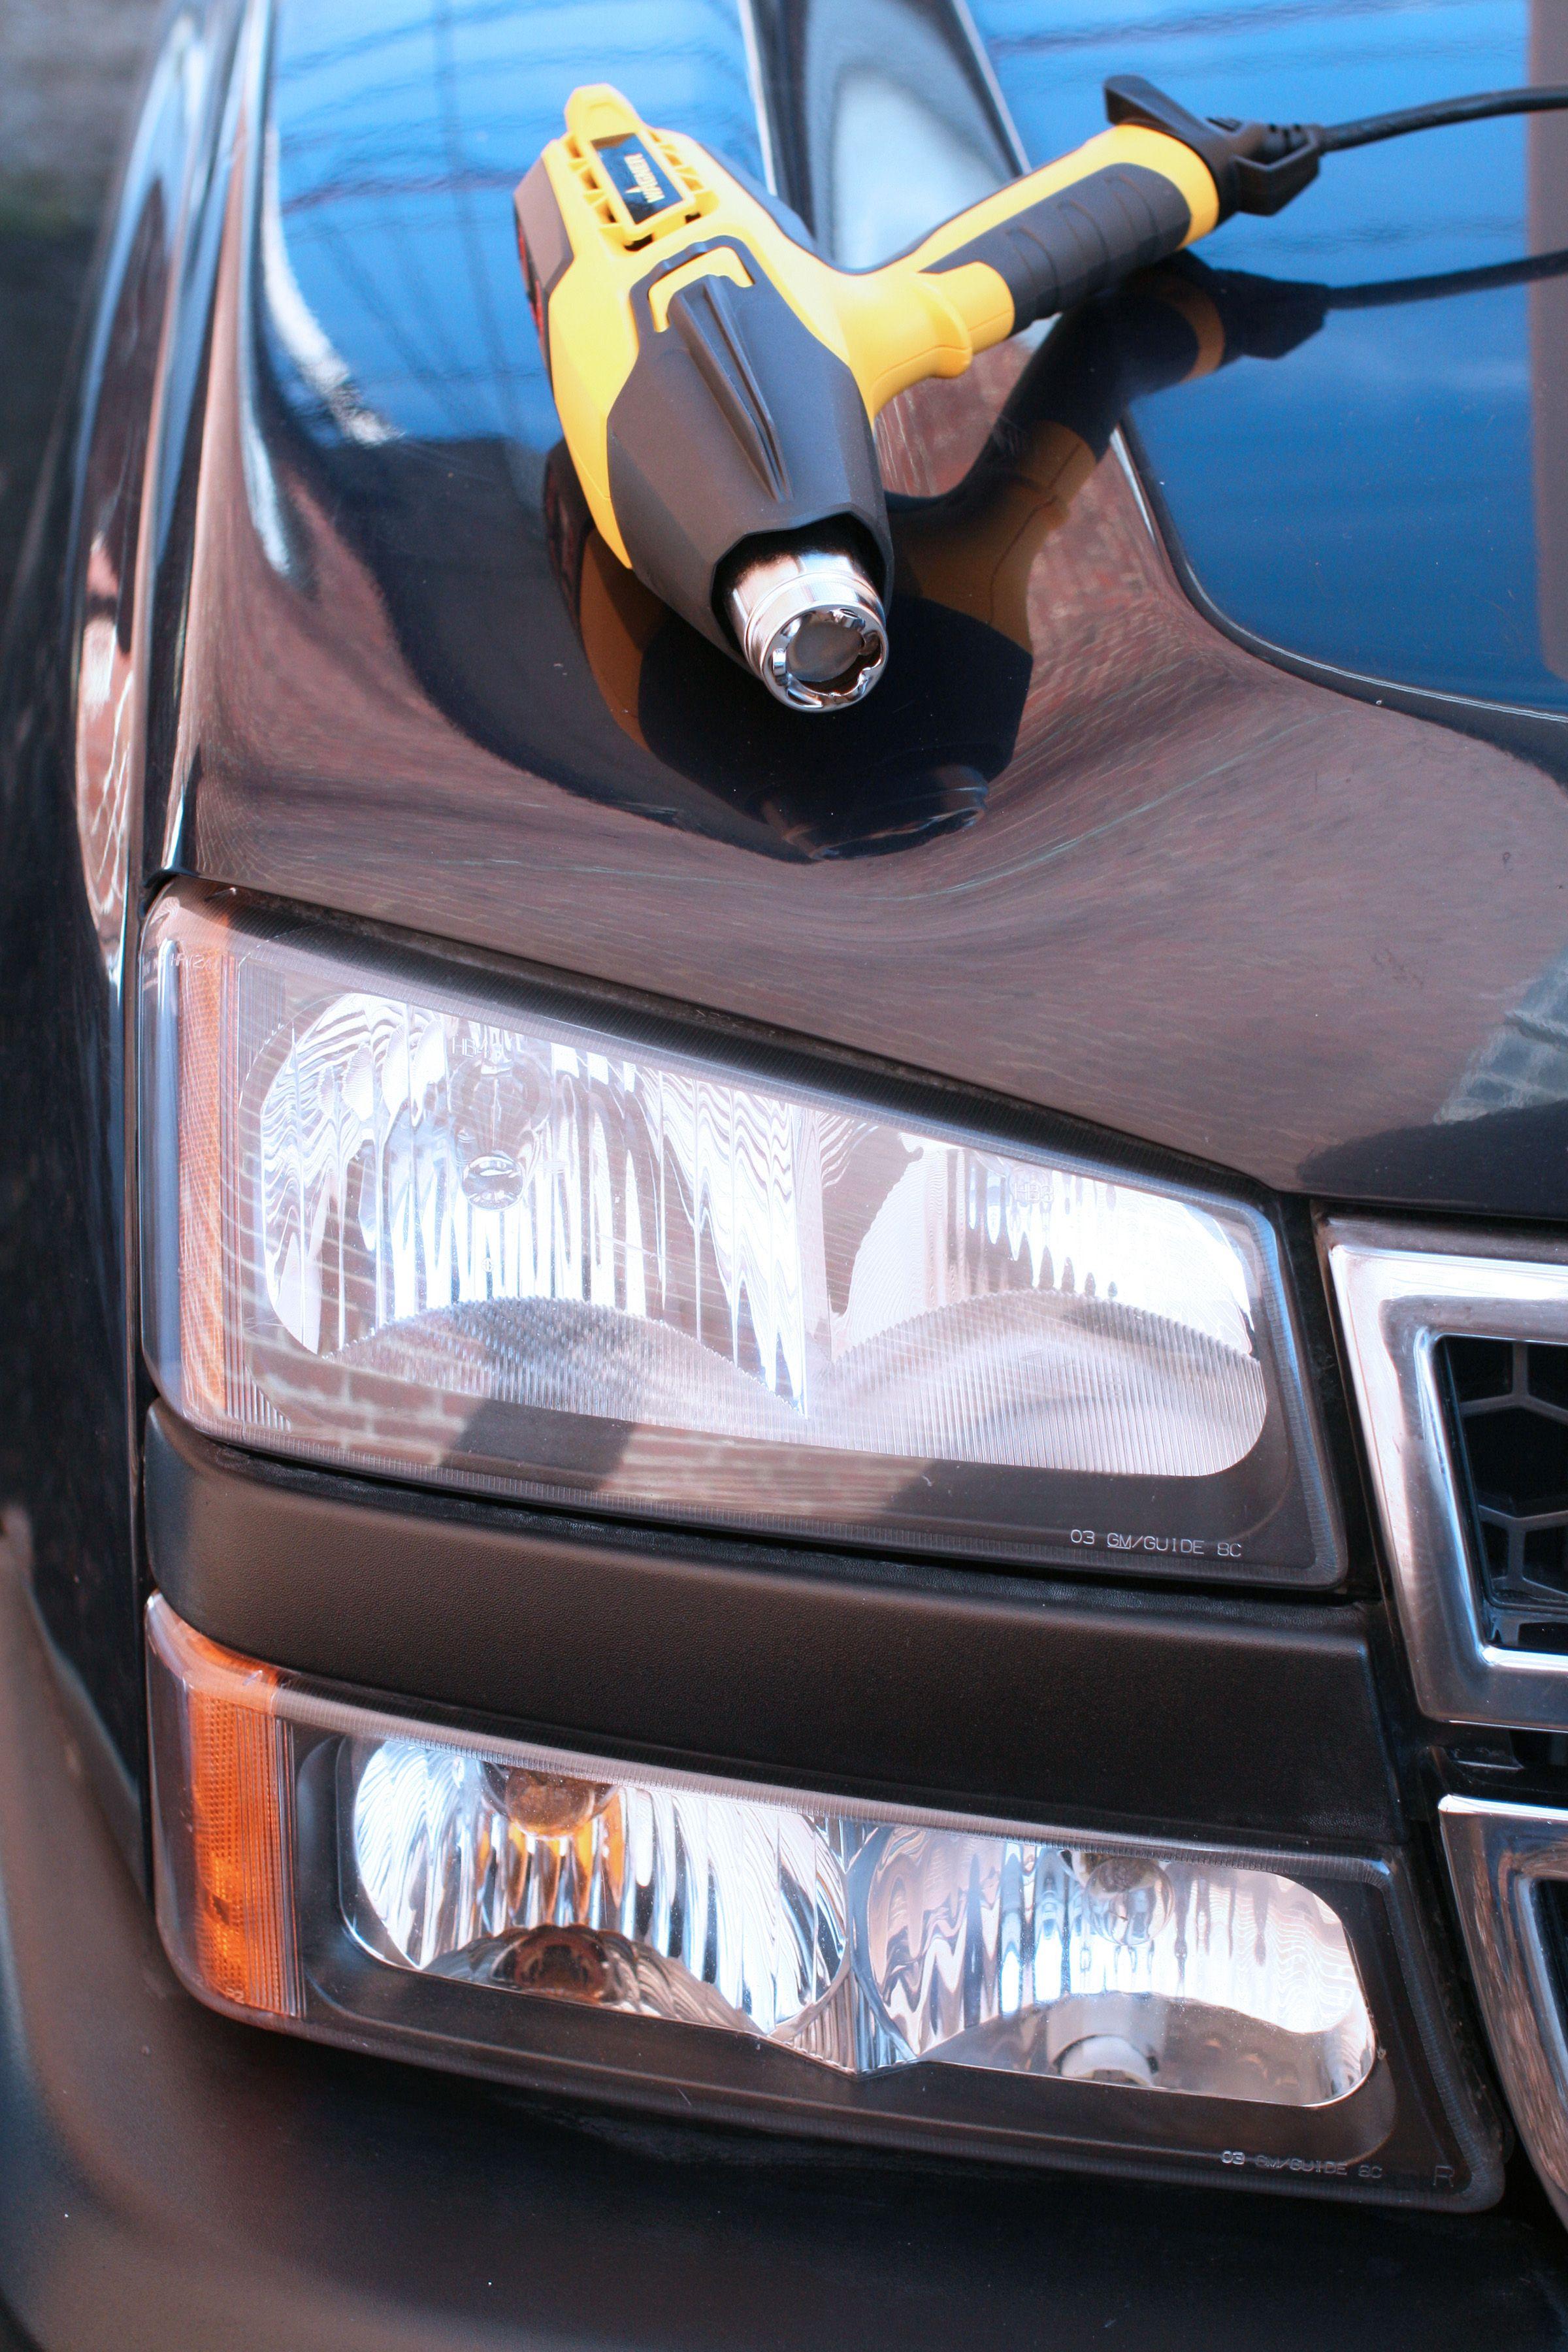 How To Fix Foggy Car Headlights With A Heat Gun Tips